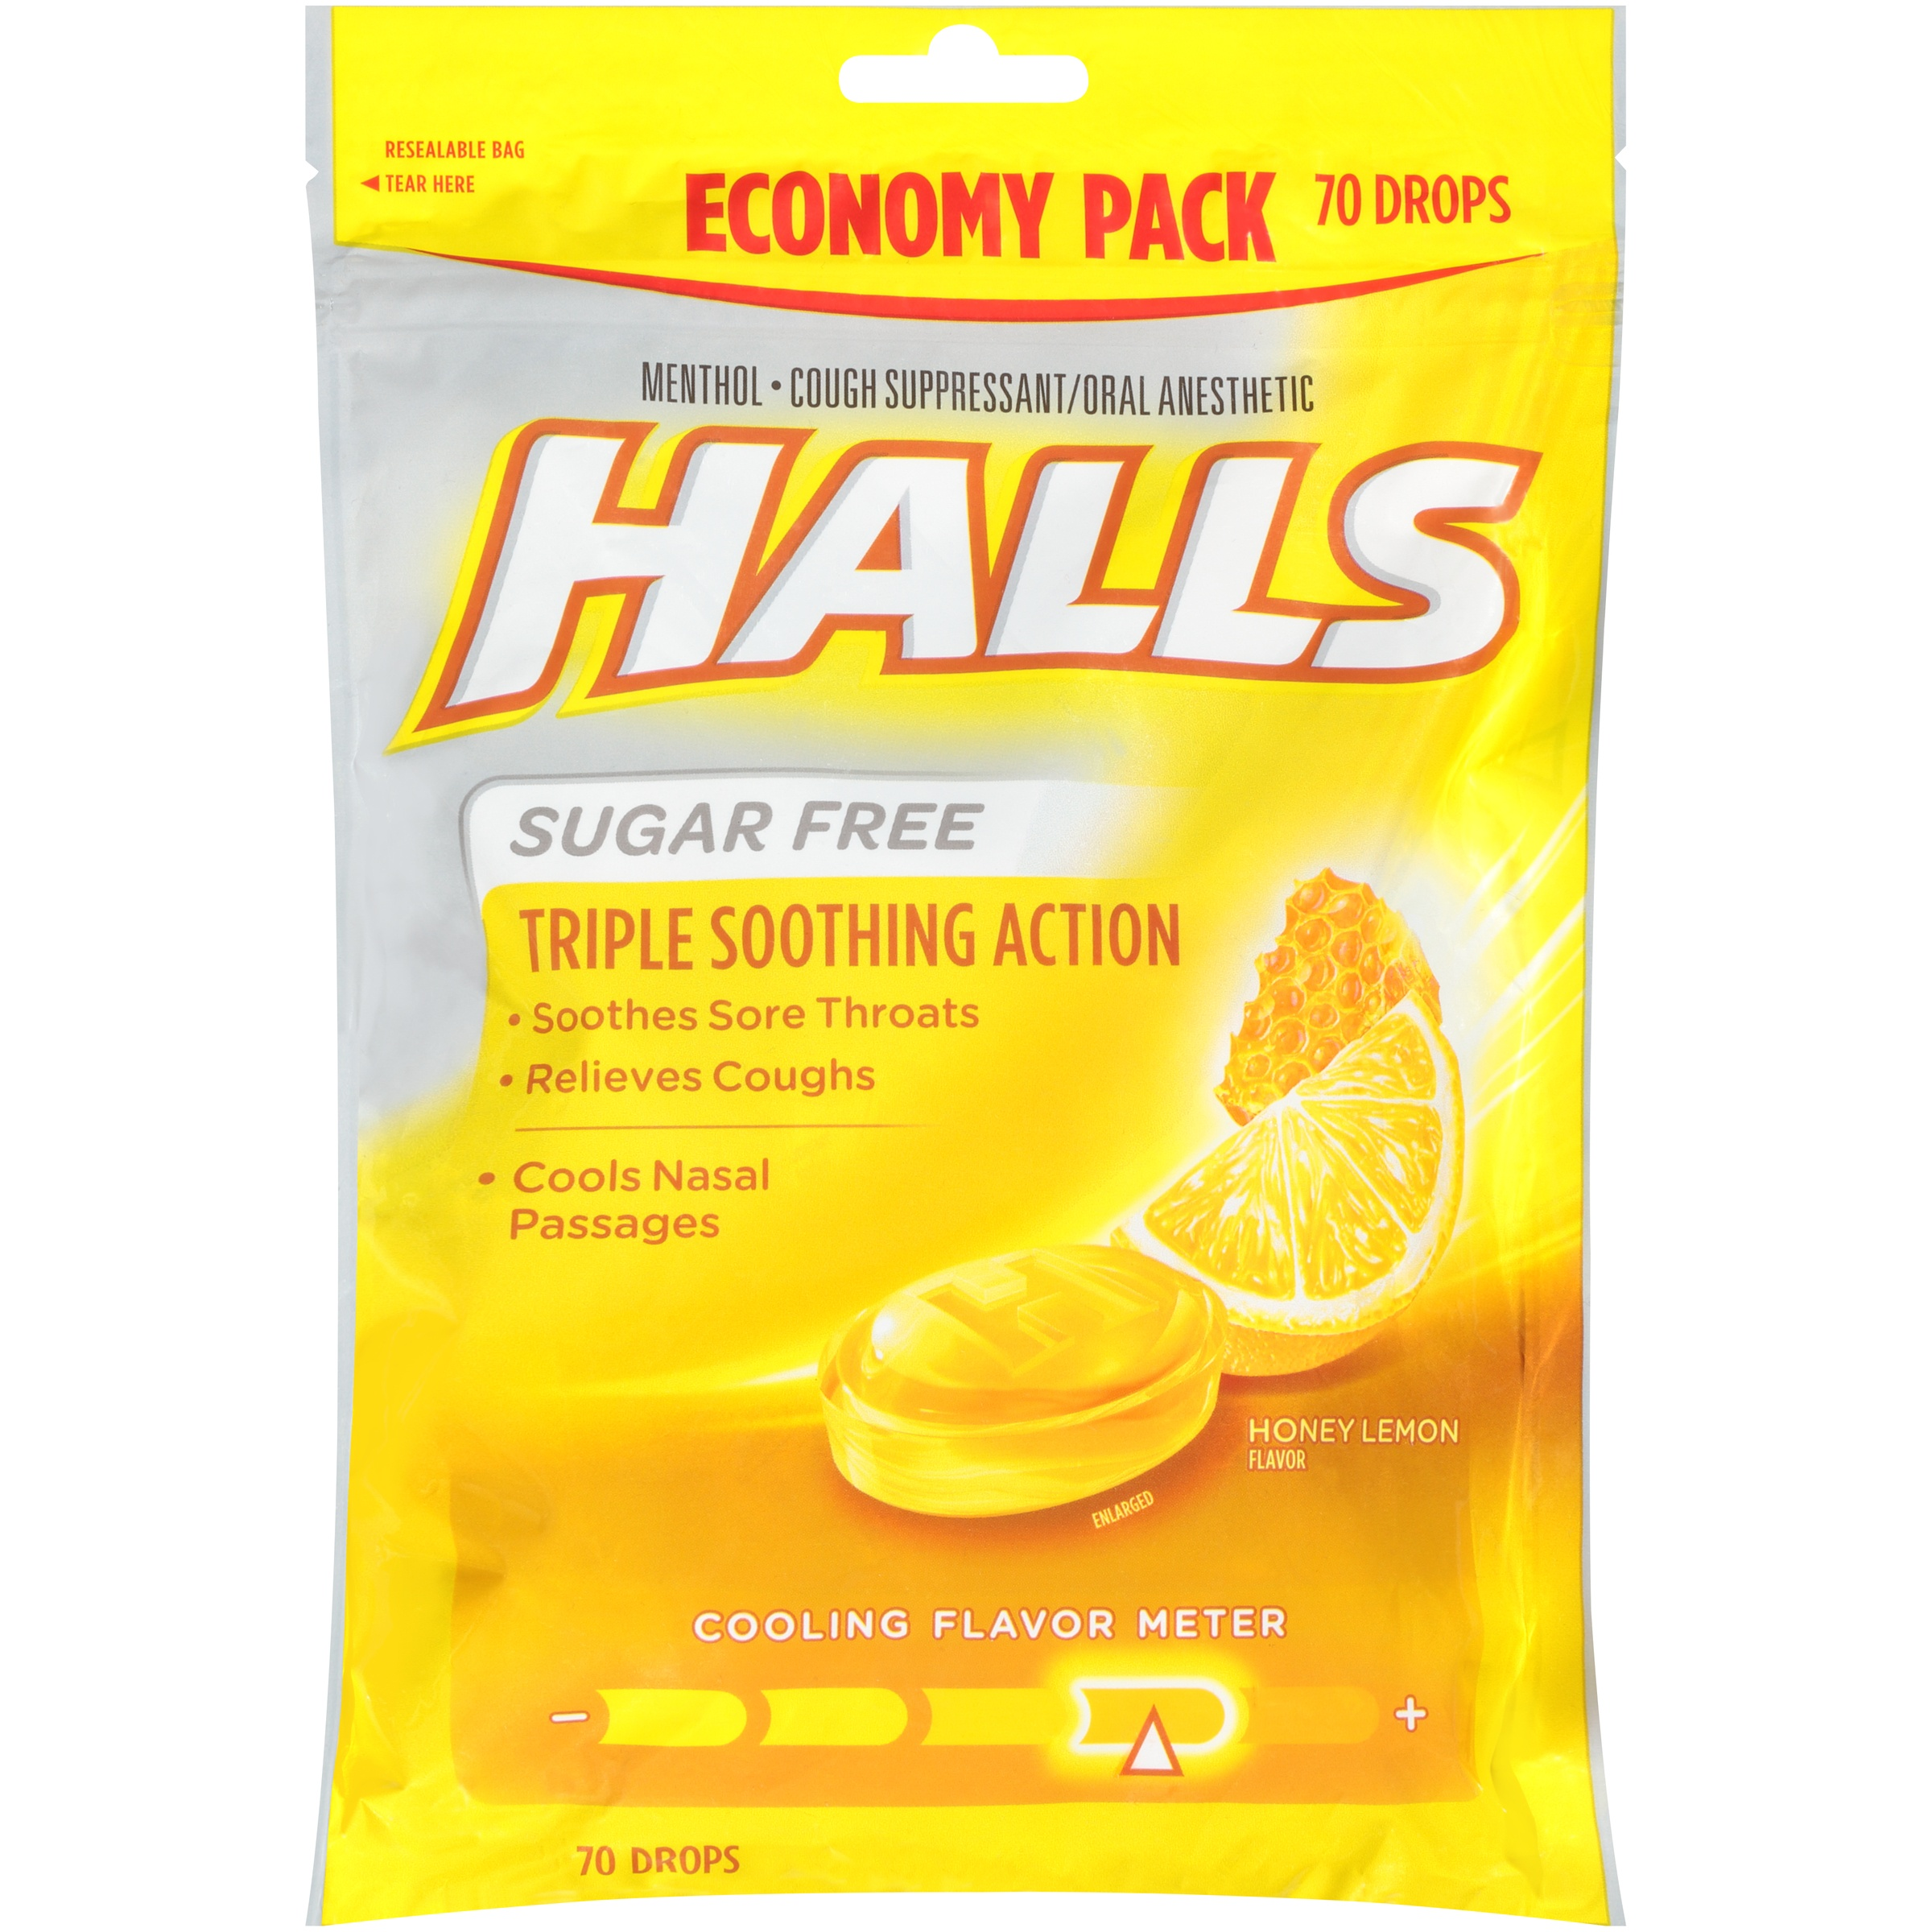 Halls Sugar Free Honey Lemon Cough Suppressant/Oral Anesthetic Menthol Drops 70 ct Bag